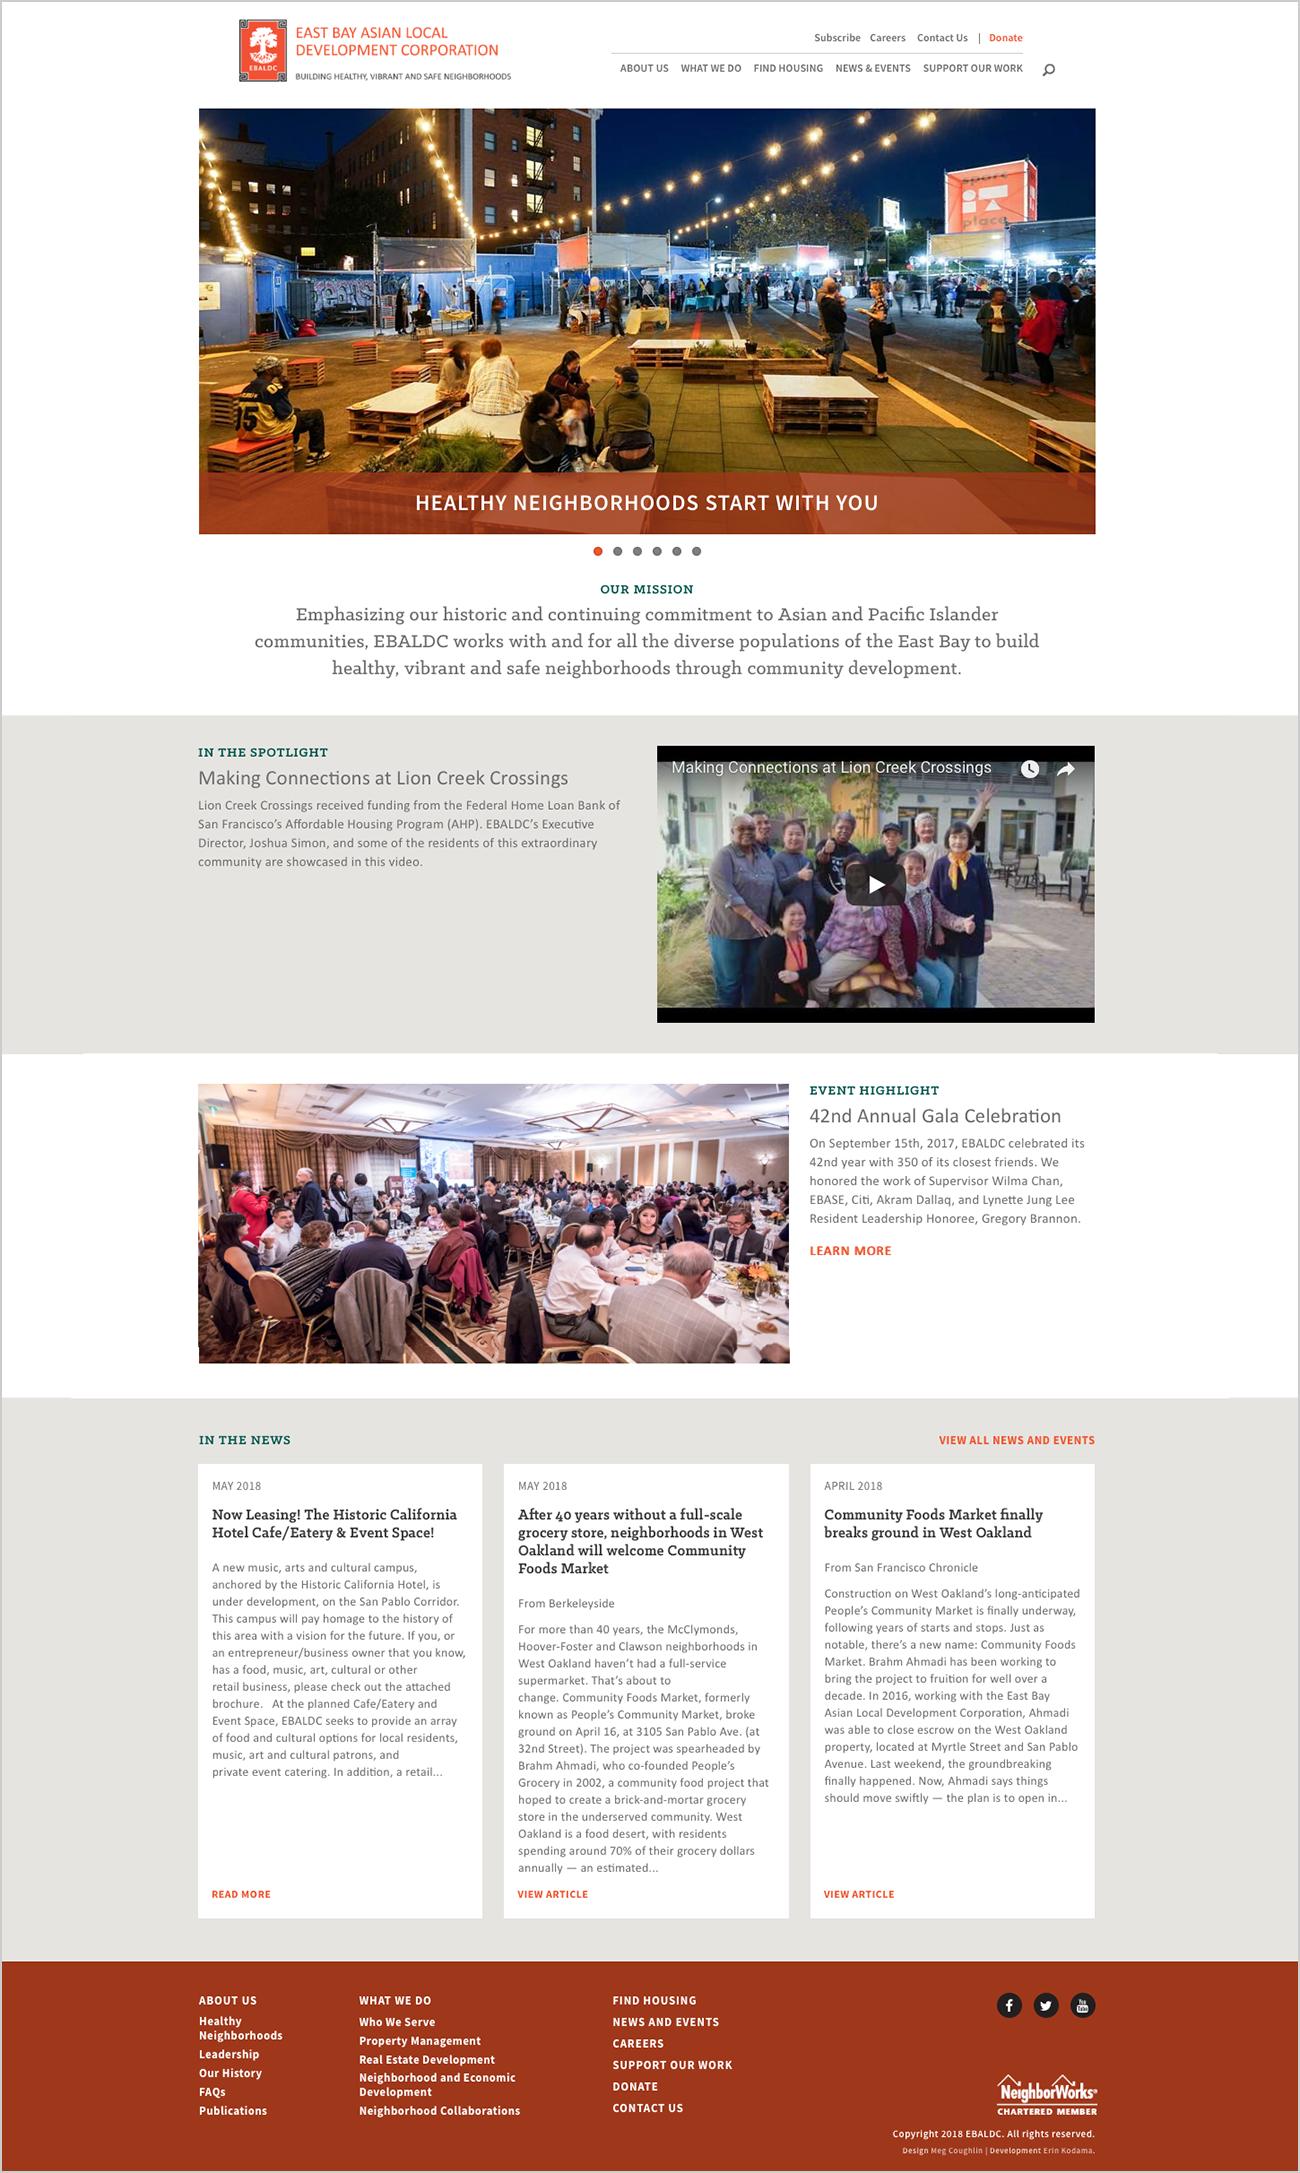 East Bay Asian Local Development Corporation website